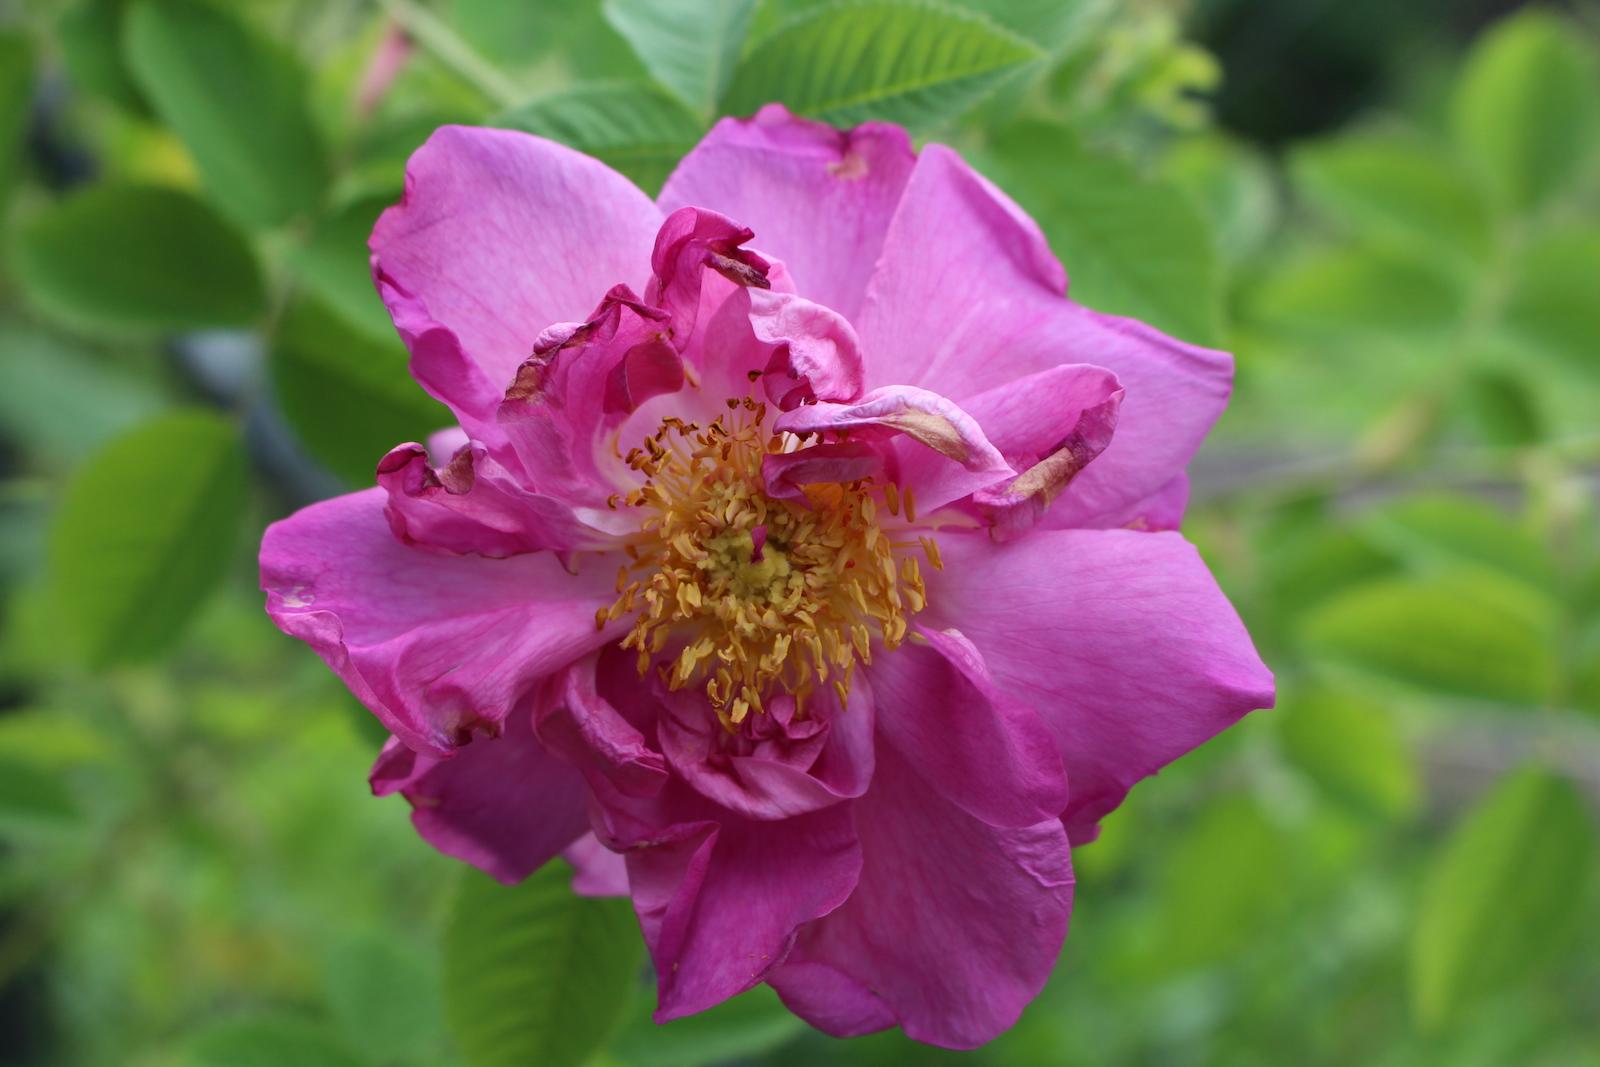 Rosa francofurtana 'Allendorf' Blüte